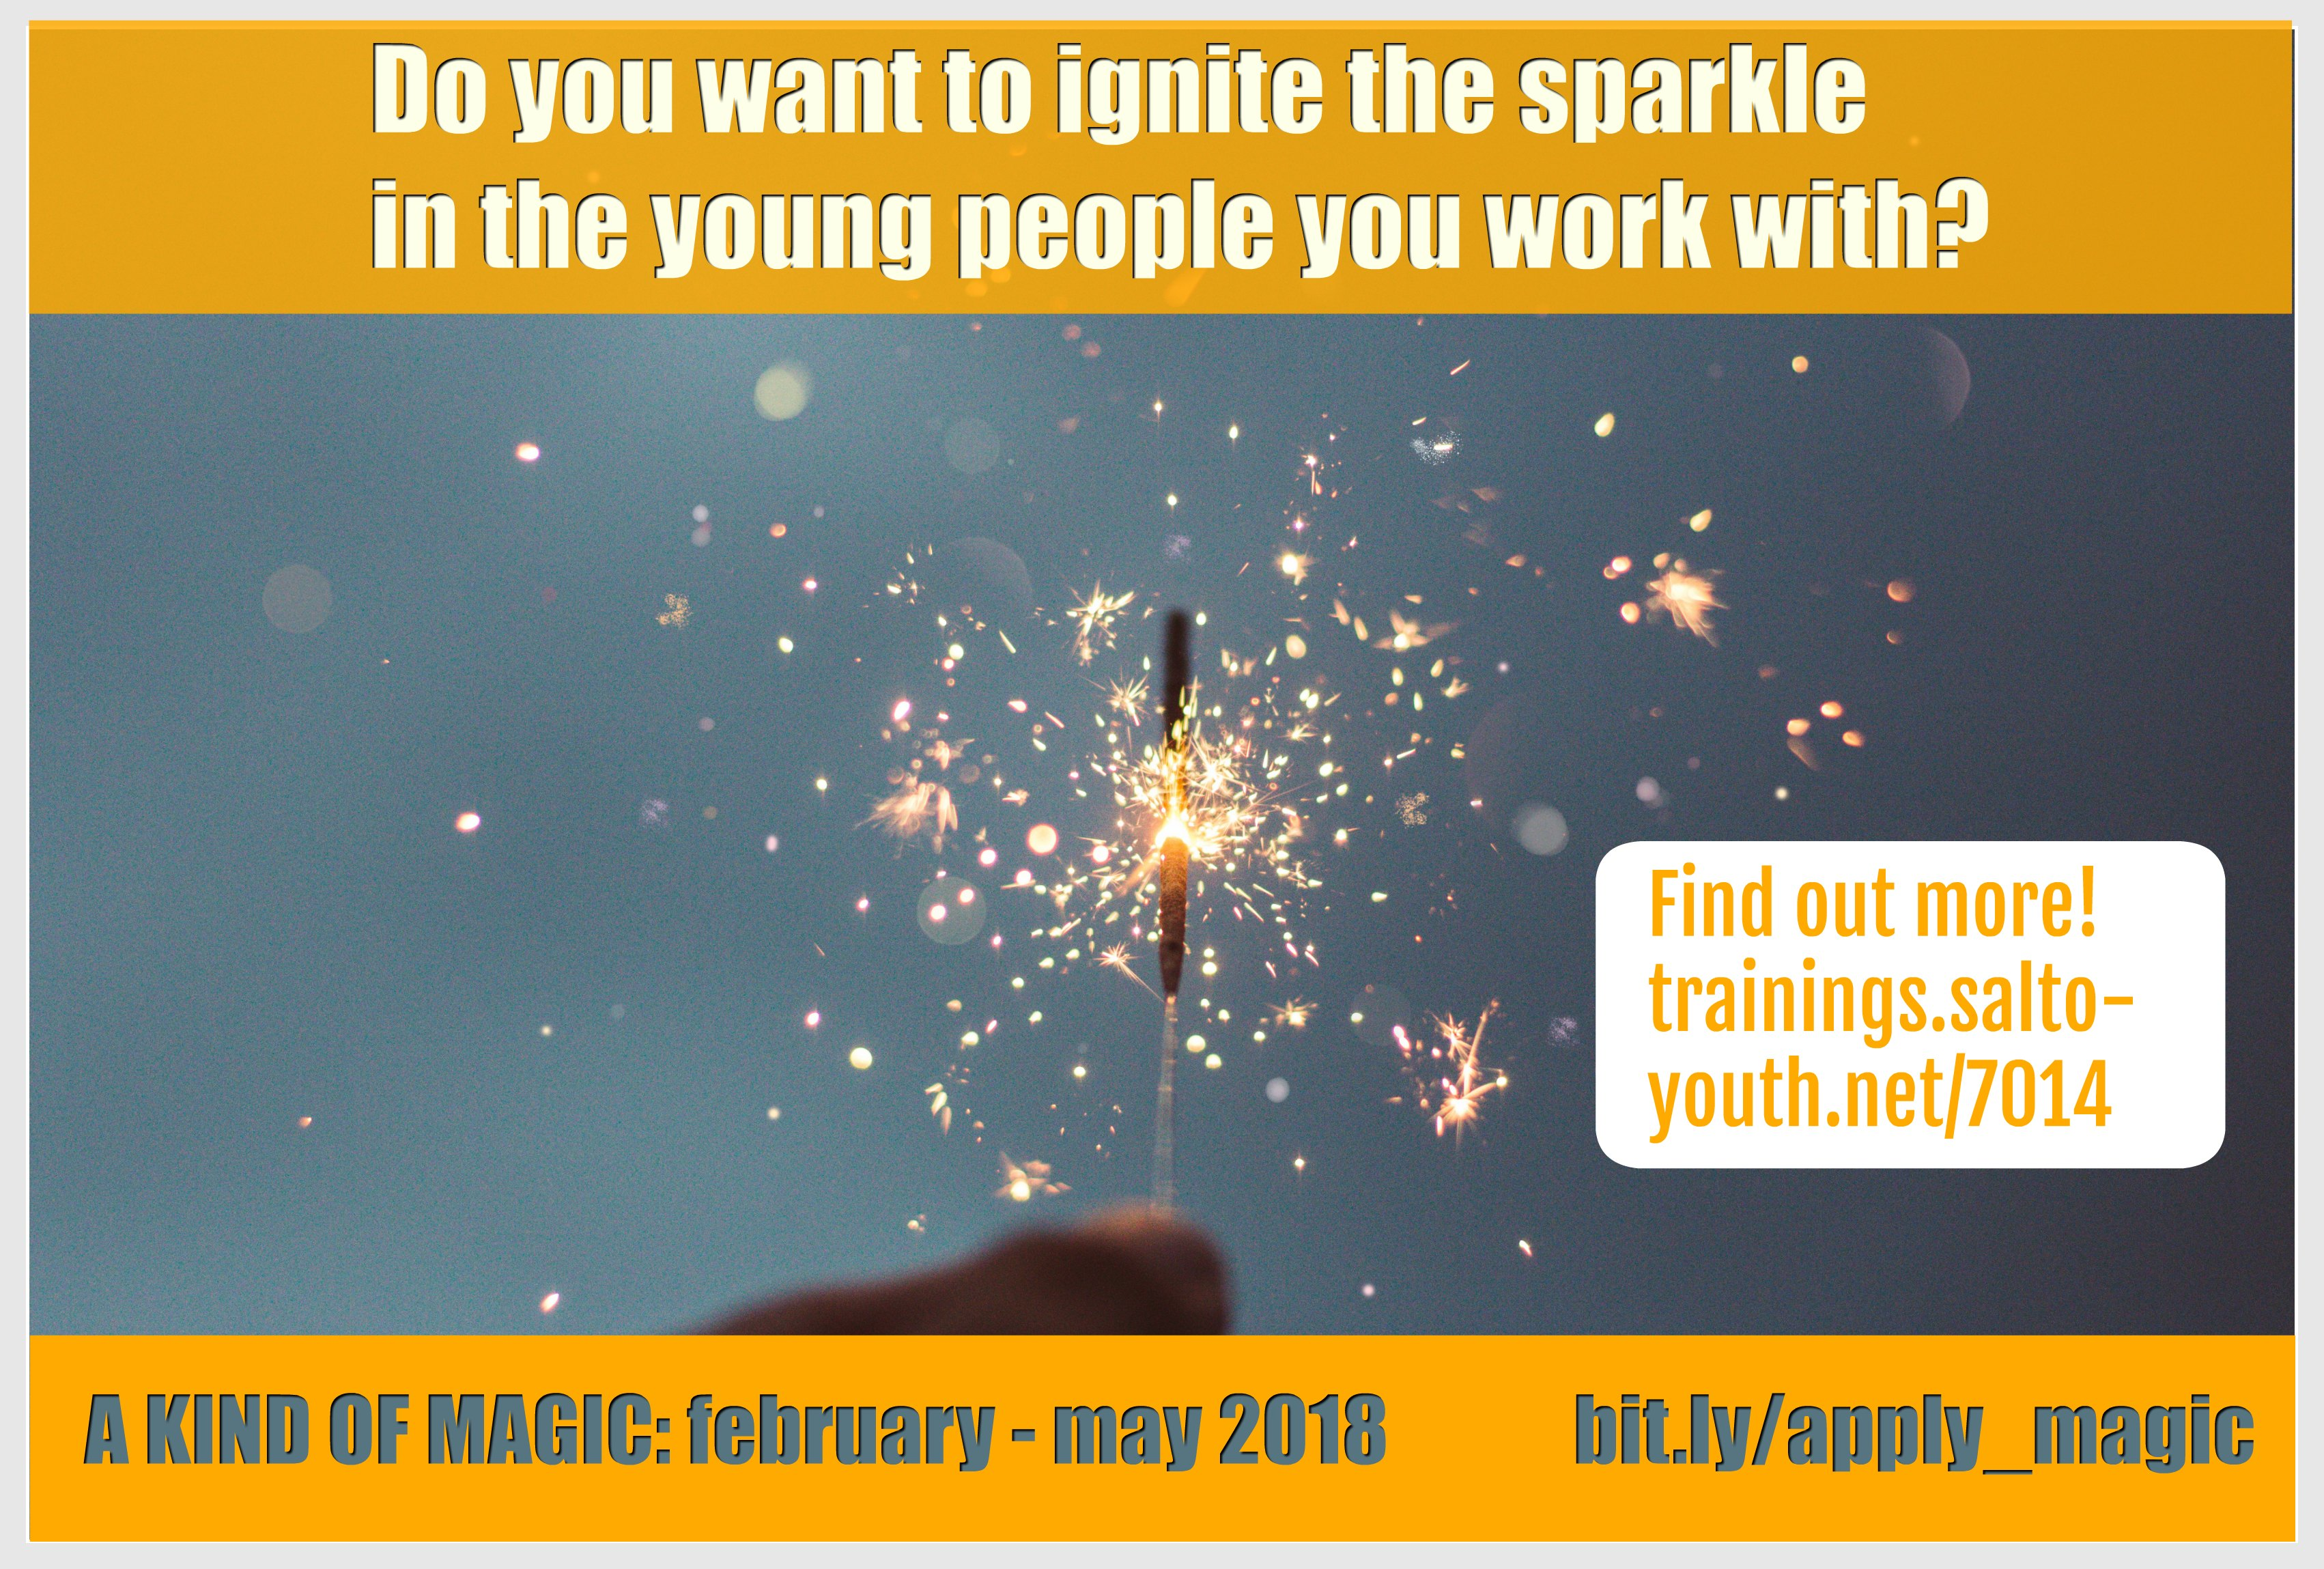 SALTO-YOUTH - European Training Calendar - European Training